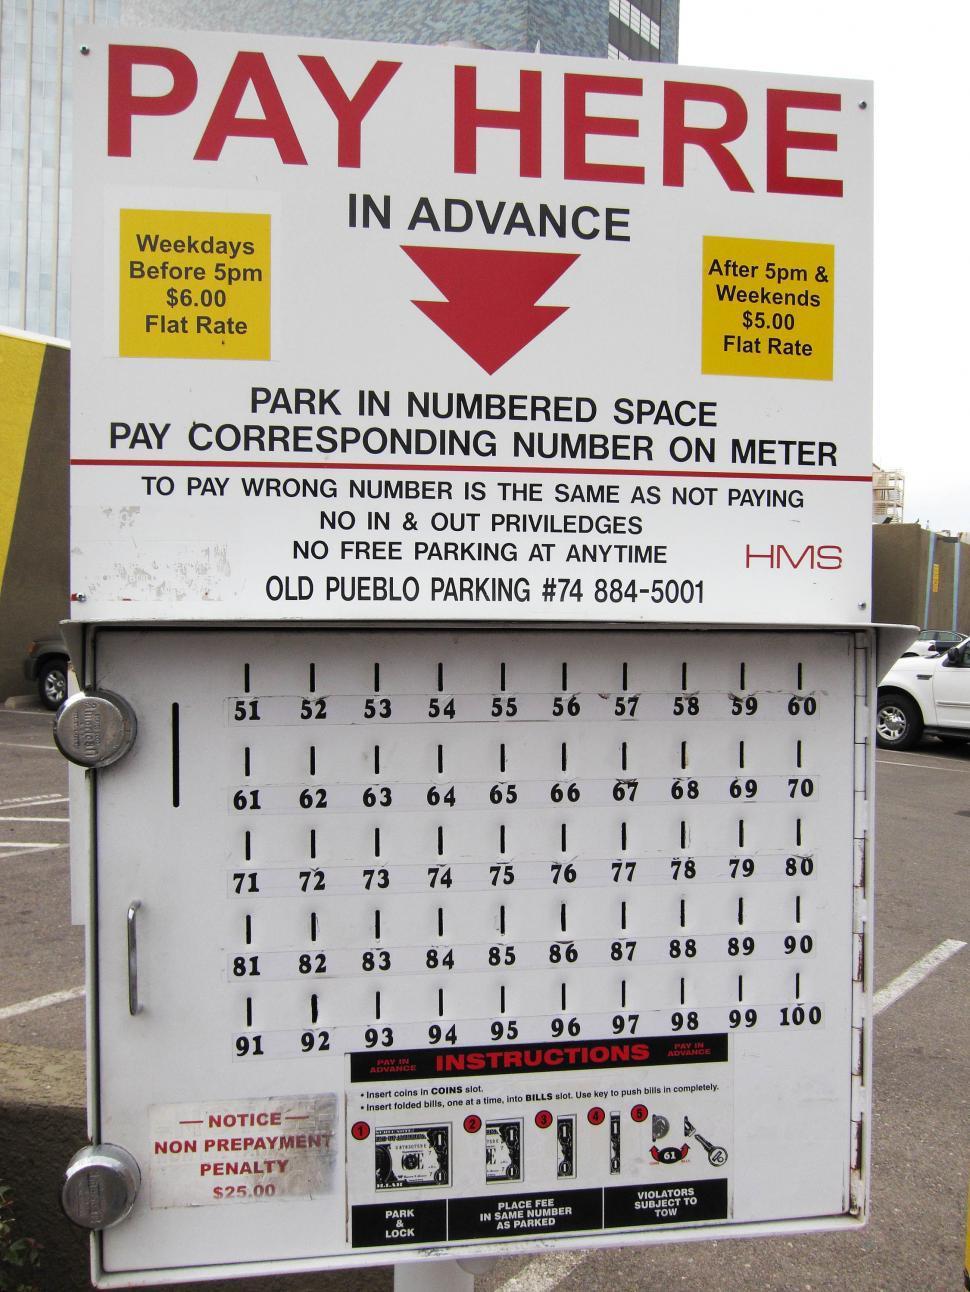 Download Free Stock Photo of parking meter